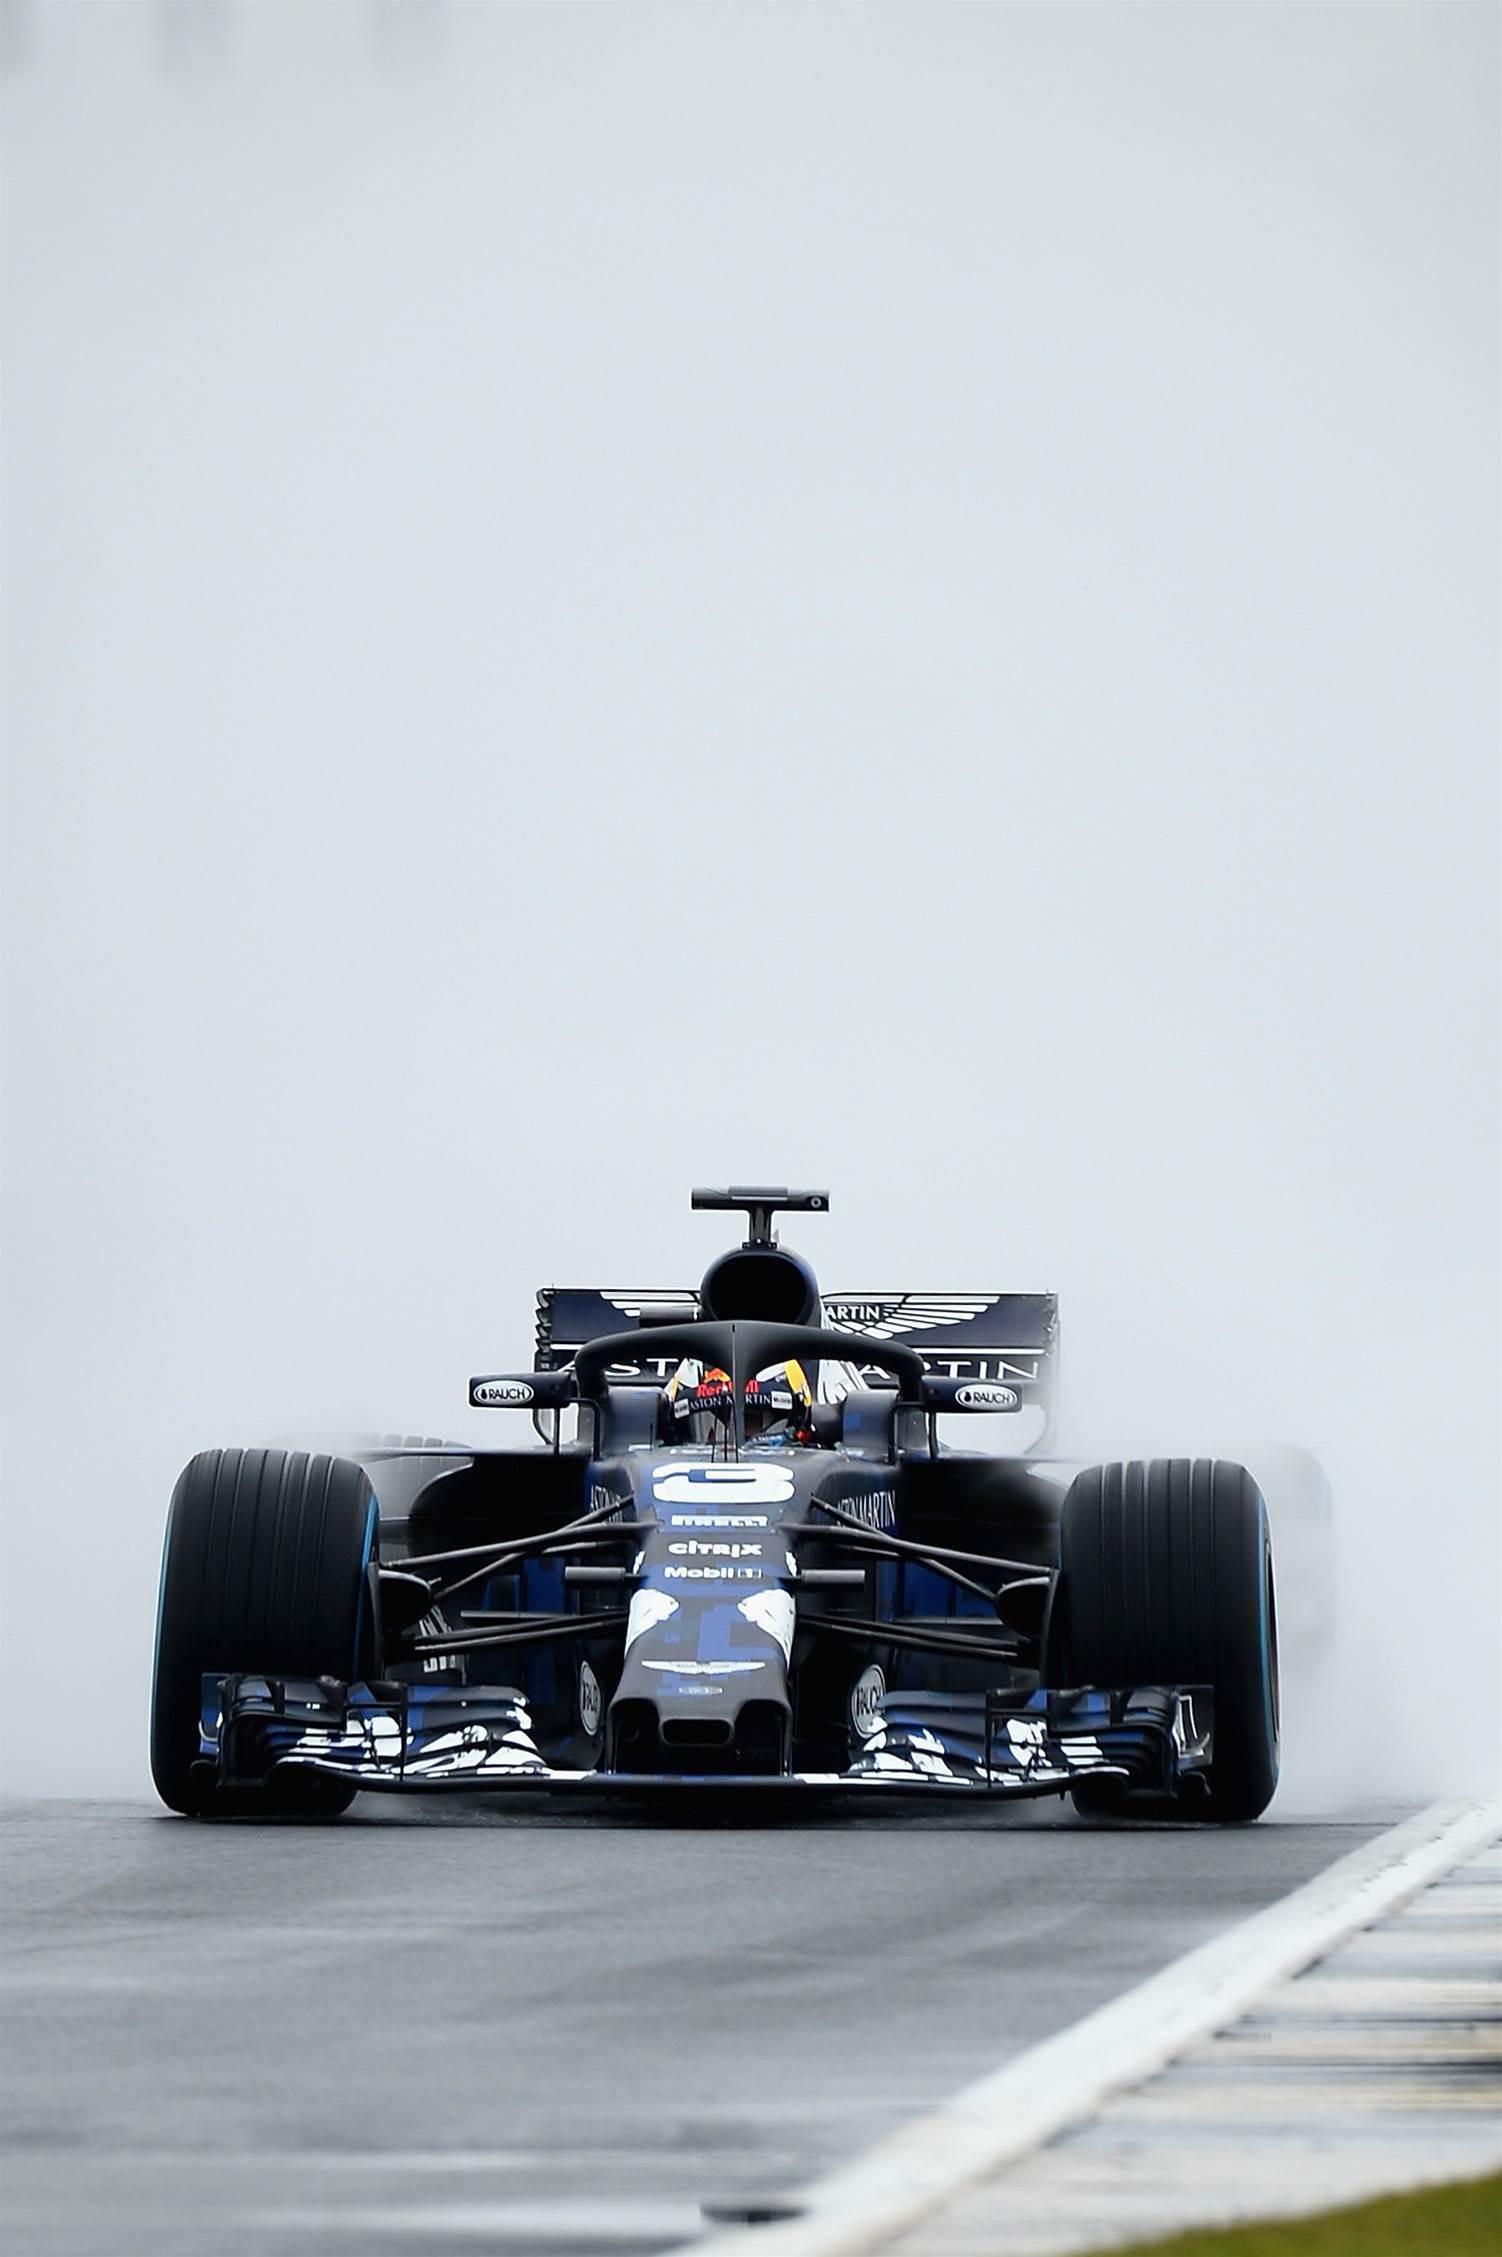 Ricciardo's 2018 Red Bull racer